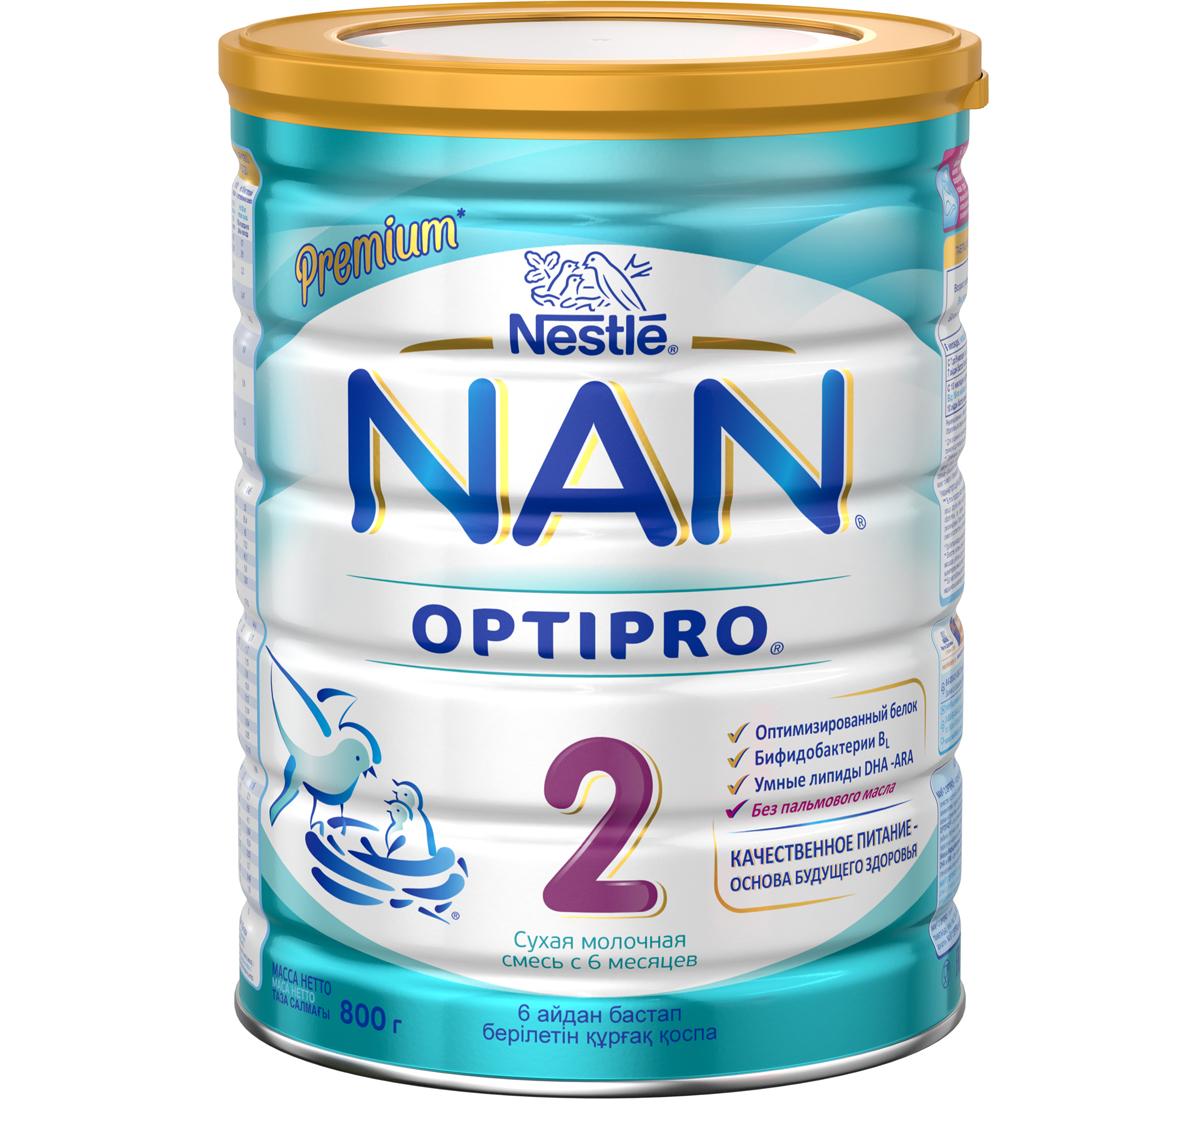 NAN 2 OPTIPRO смесь молочная, с 6 месяцев, 800 г